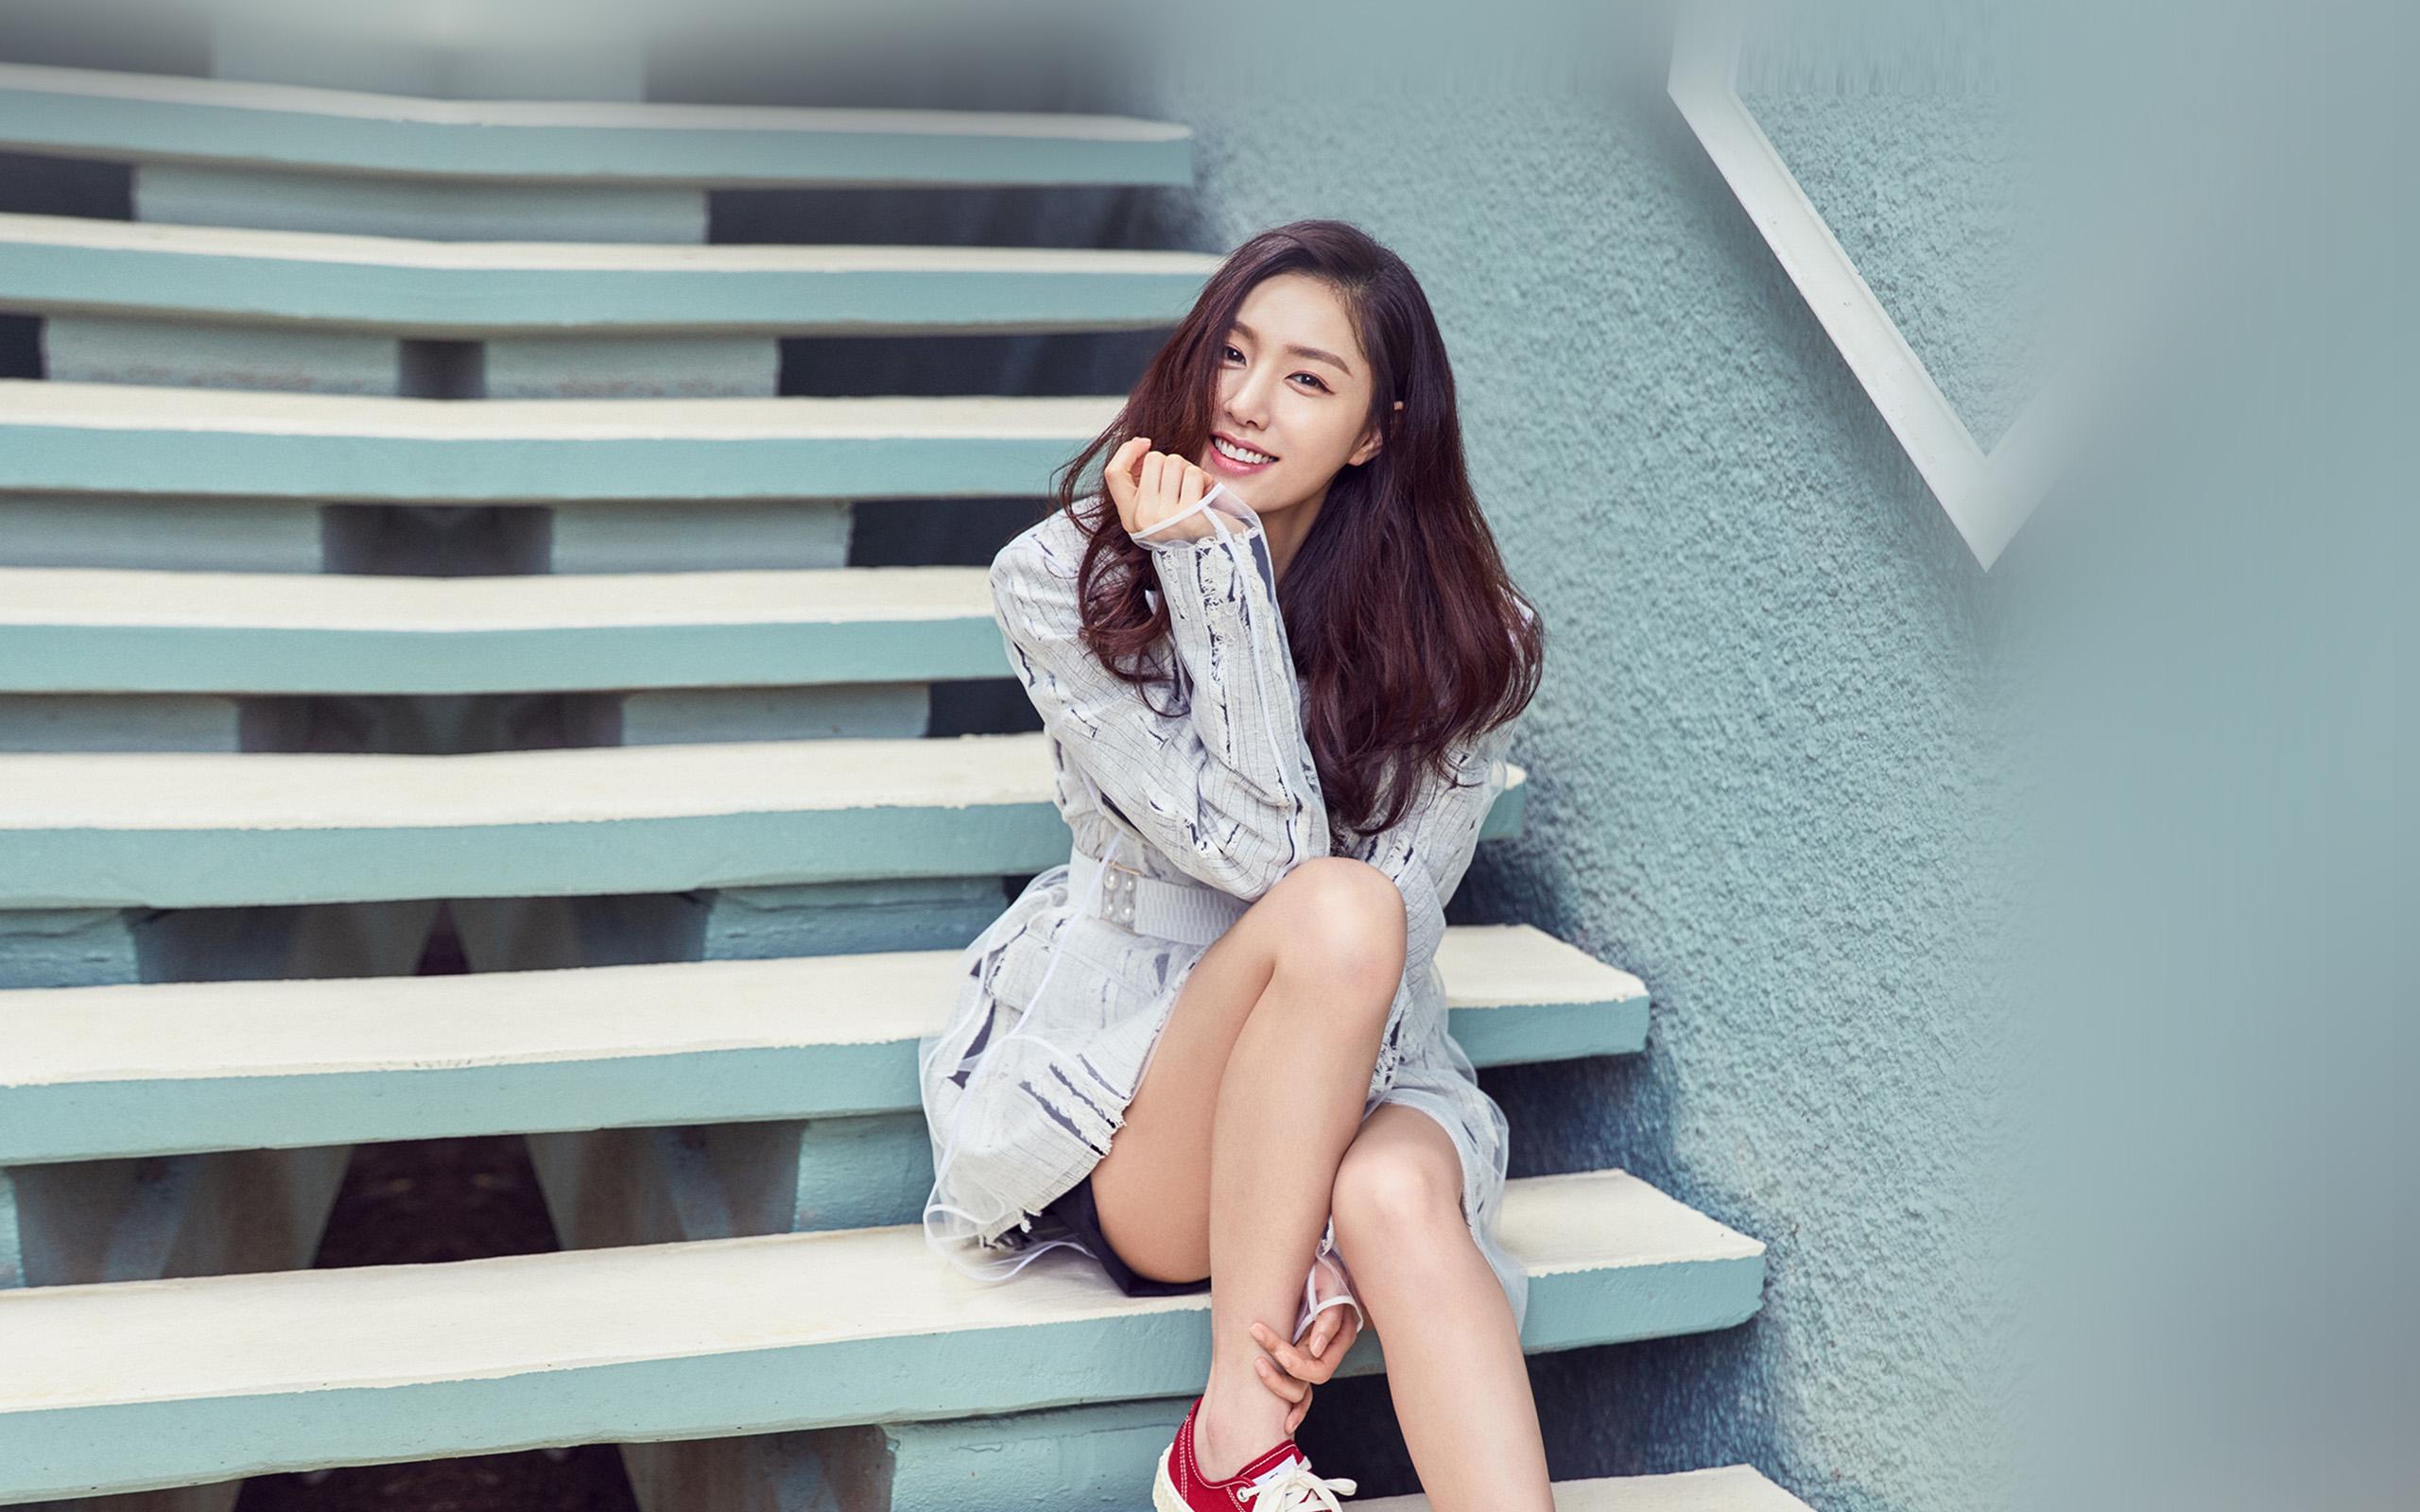 Girl In Rain Hd Wallpaper Hq75 Kpop Girl Stair Korean Wallpaper